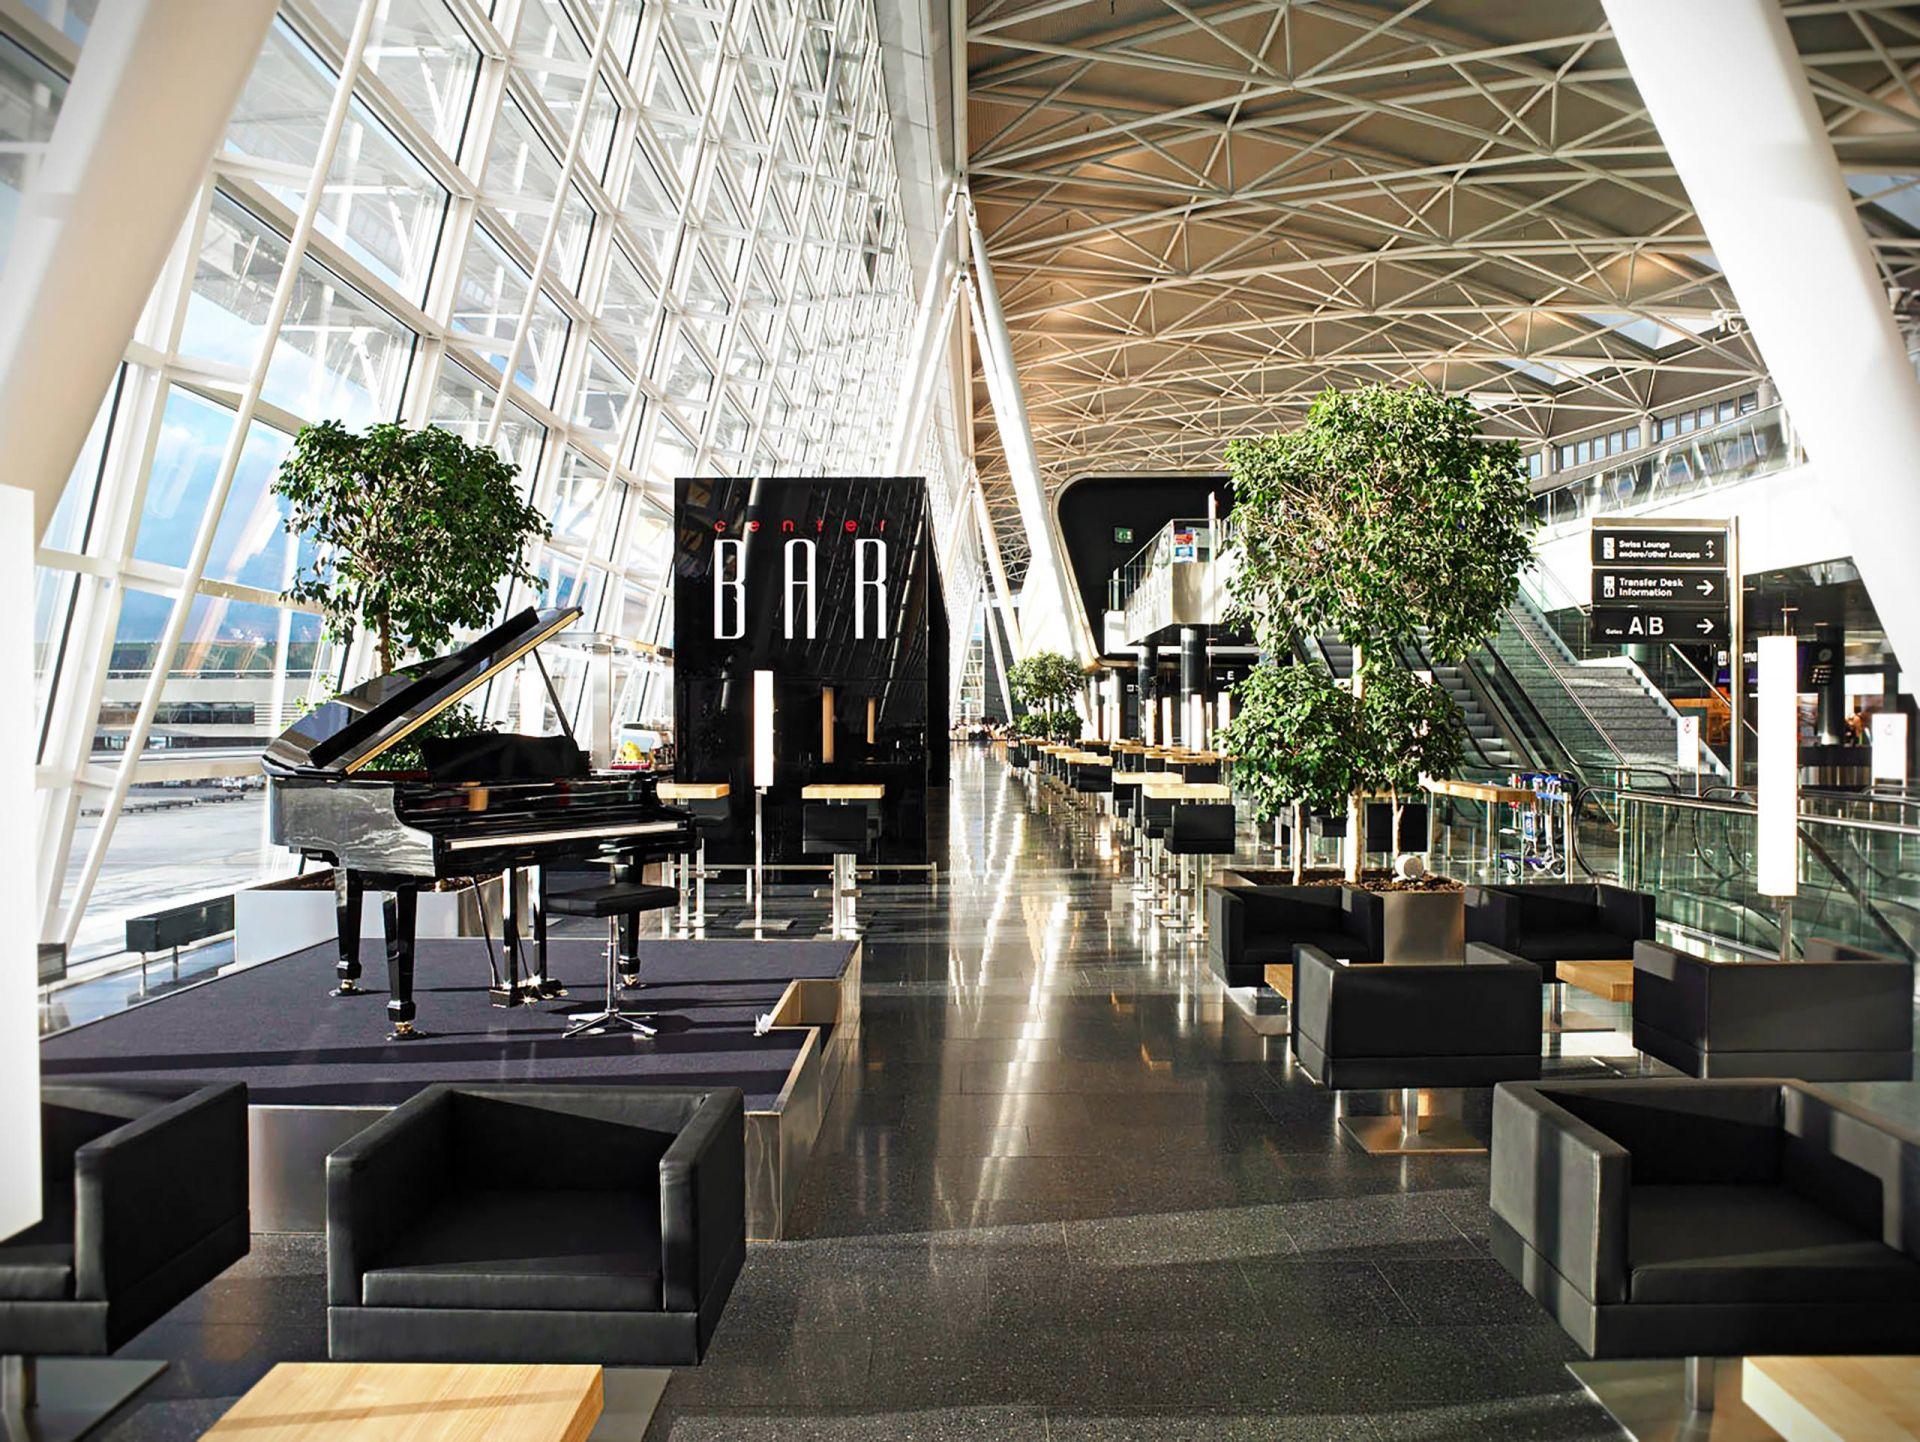 Sidelong Total View Center Bar Zurich Airport Zurich